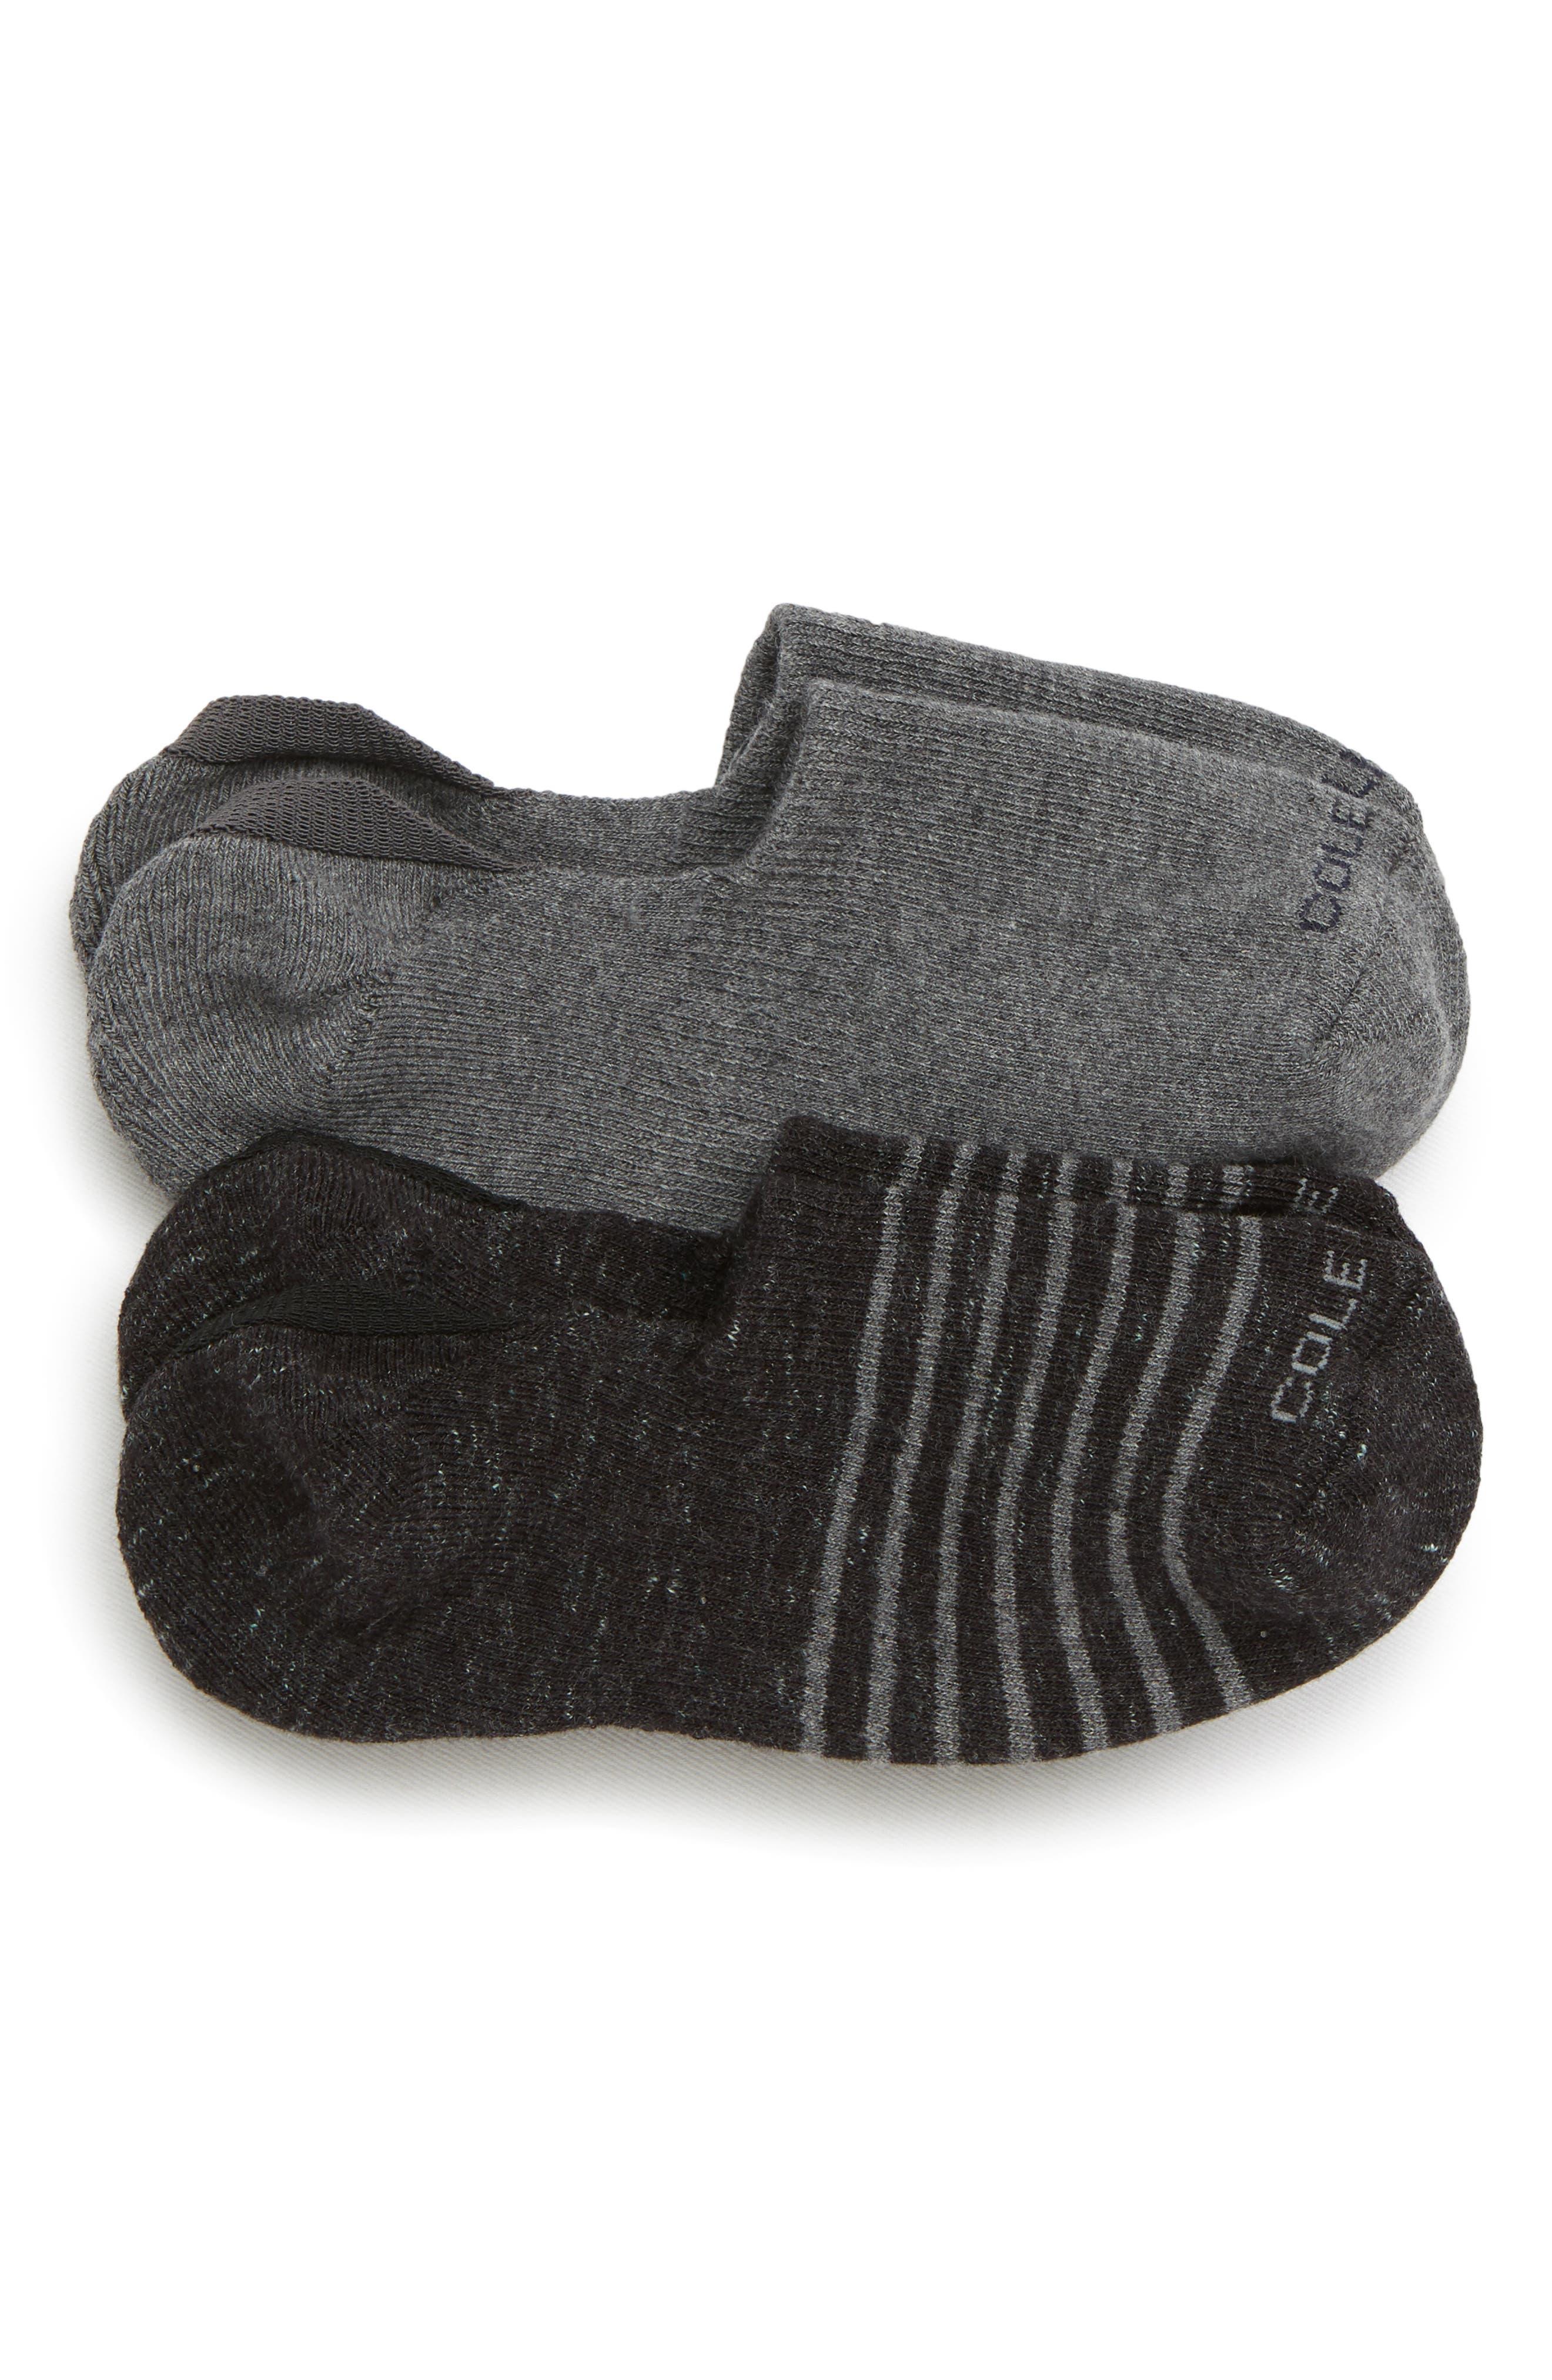 2-Pack No-Show Socks,                             Main thumbnail 1, color,                             BLACK